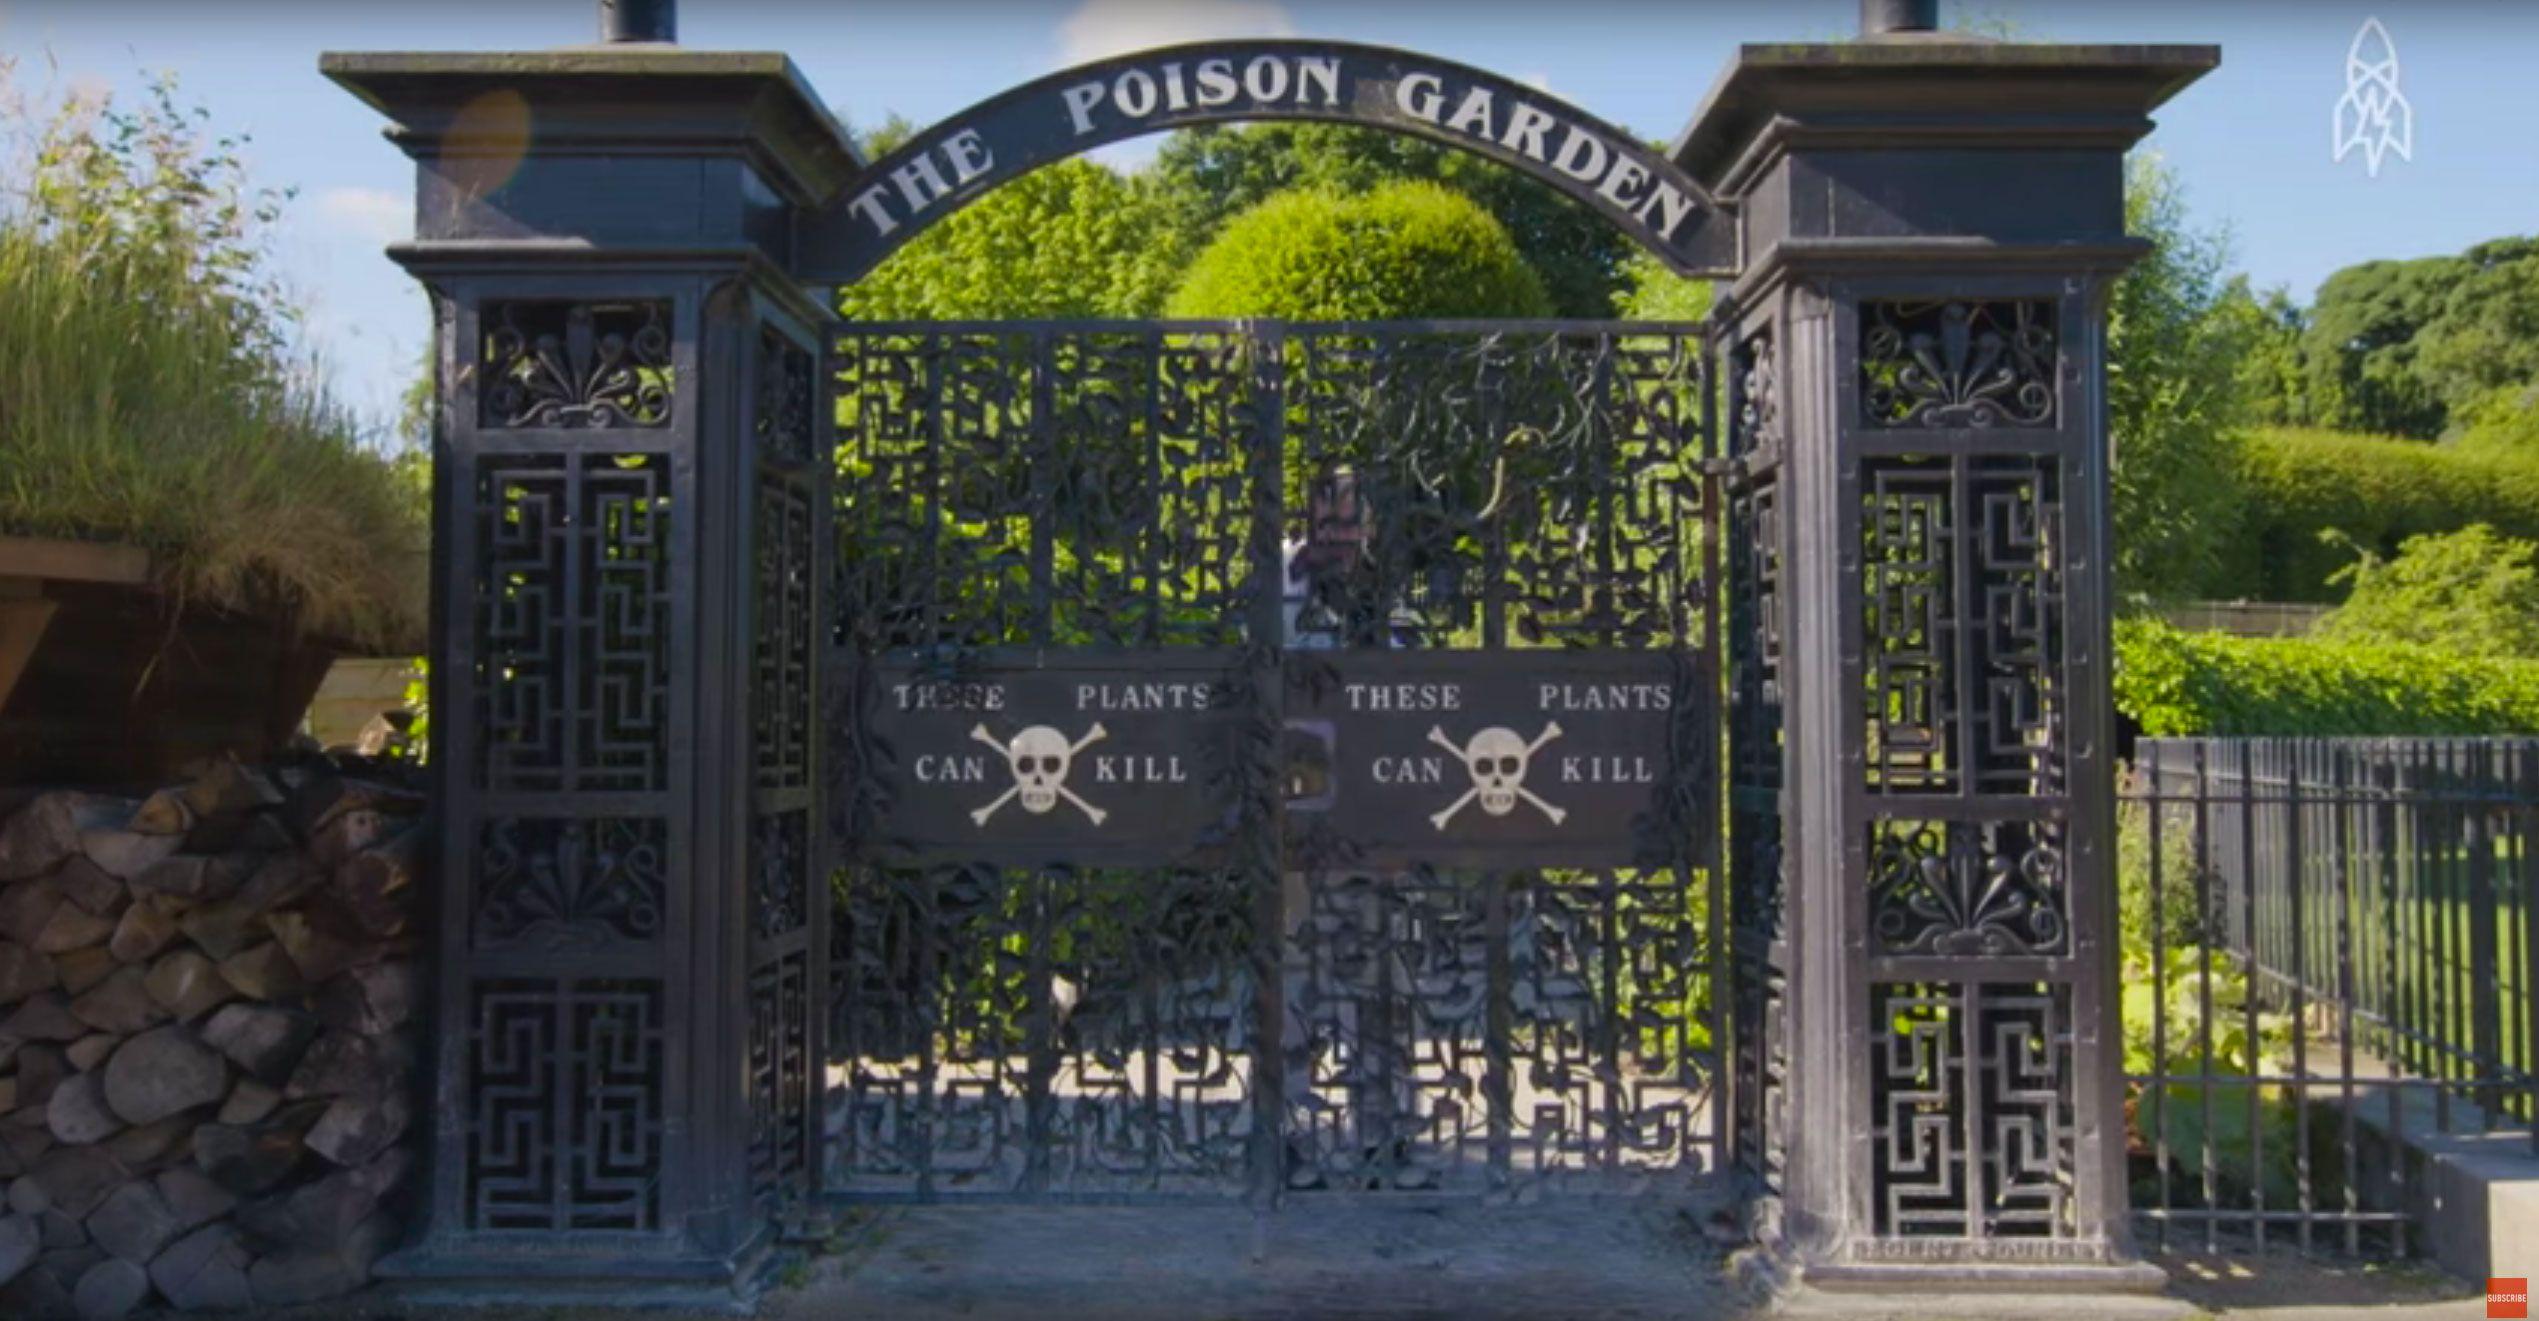 The Most Dangerous Garden On Earth